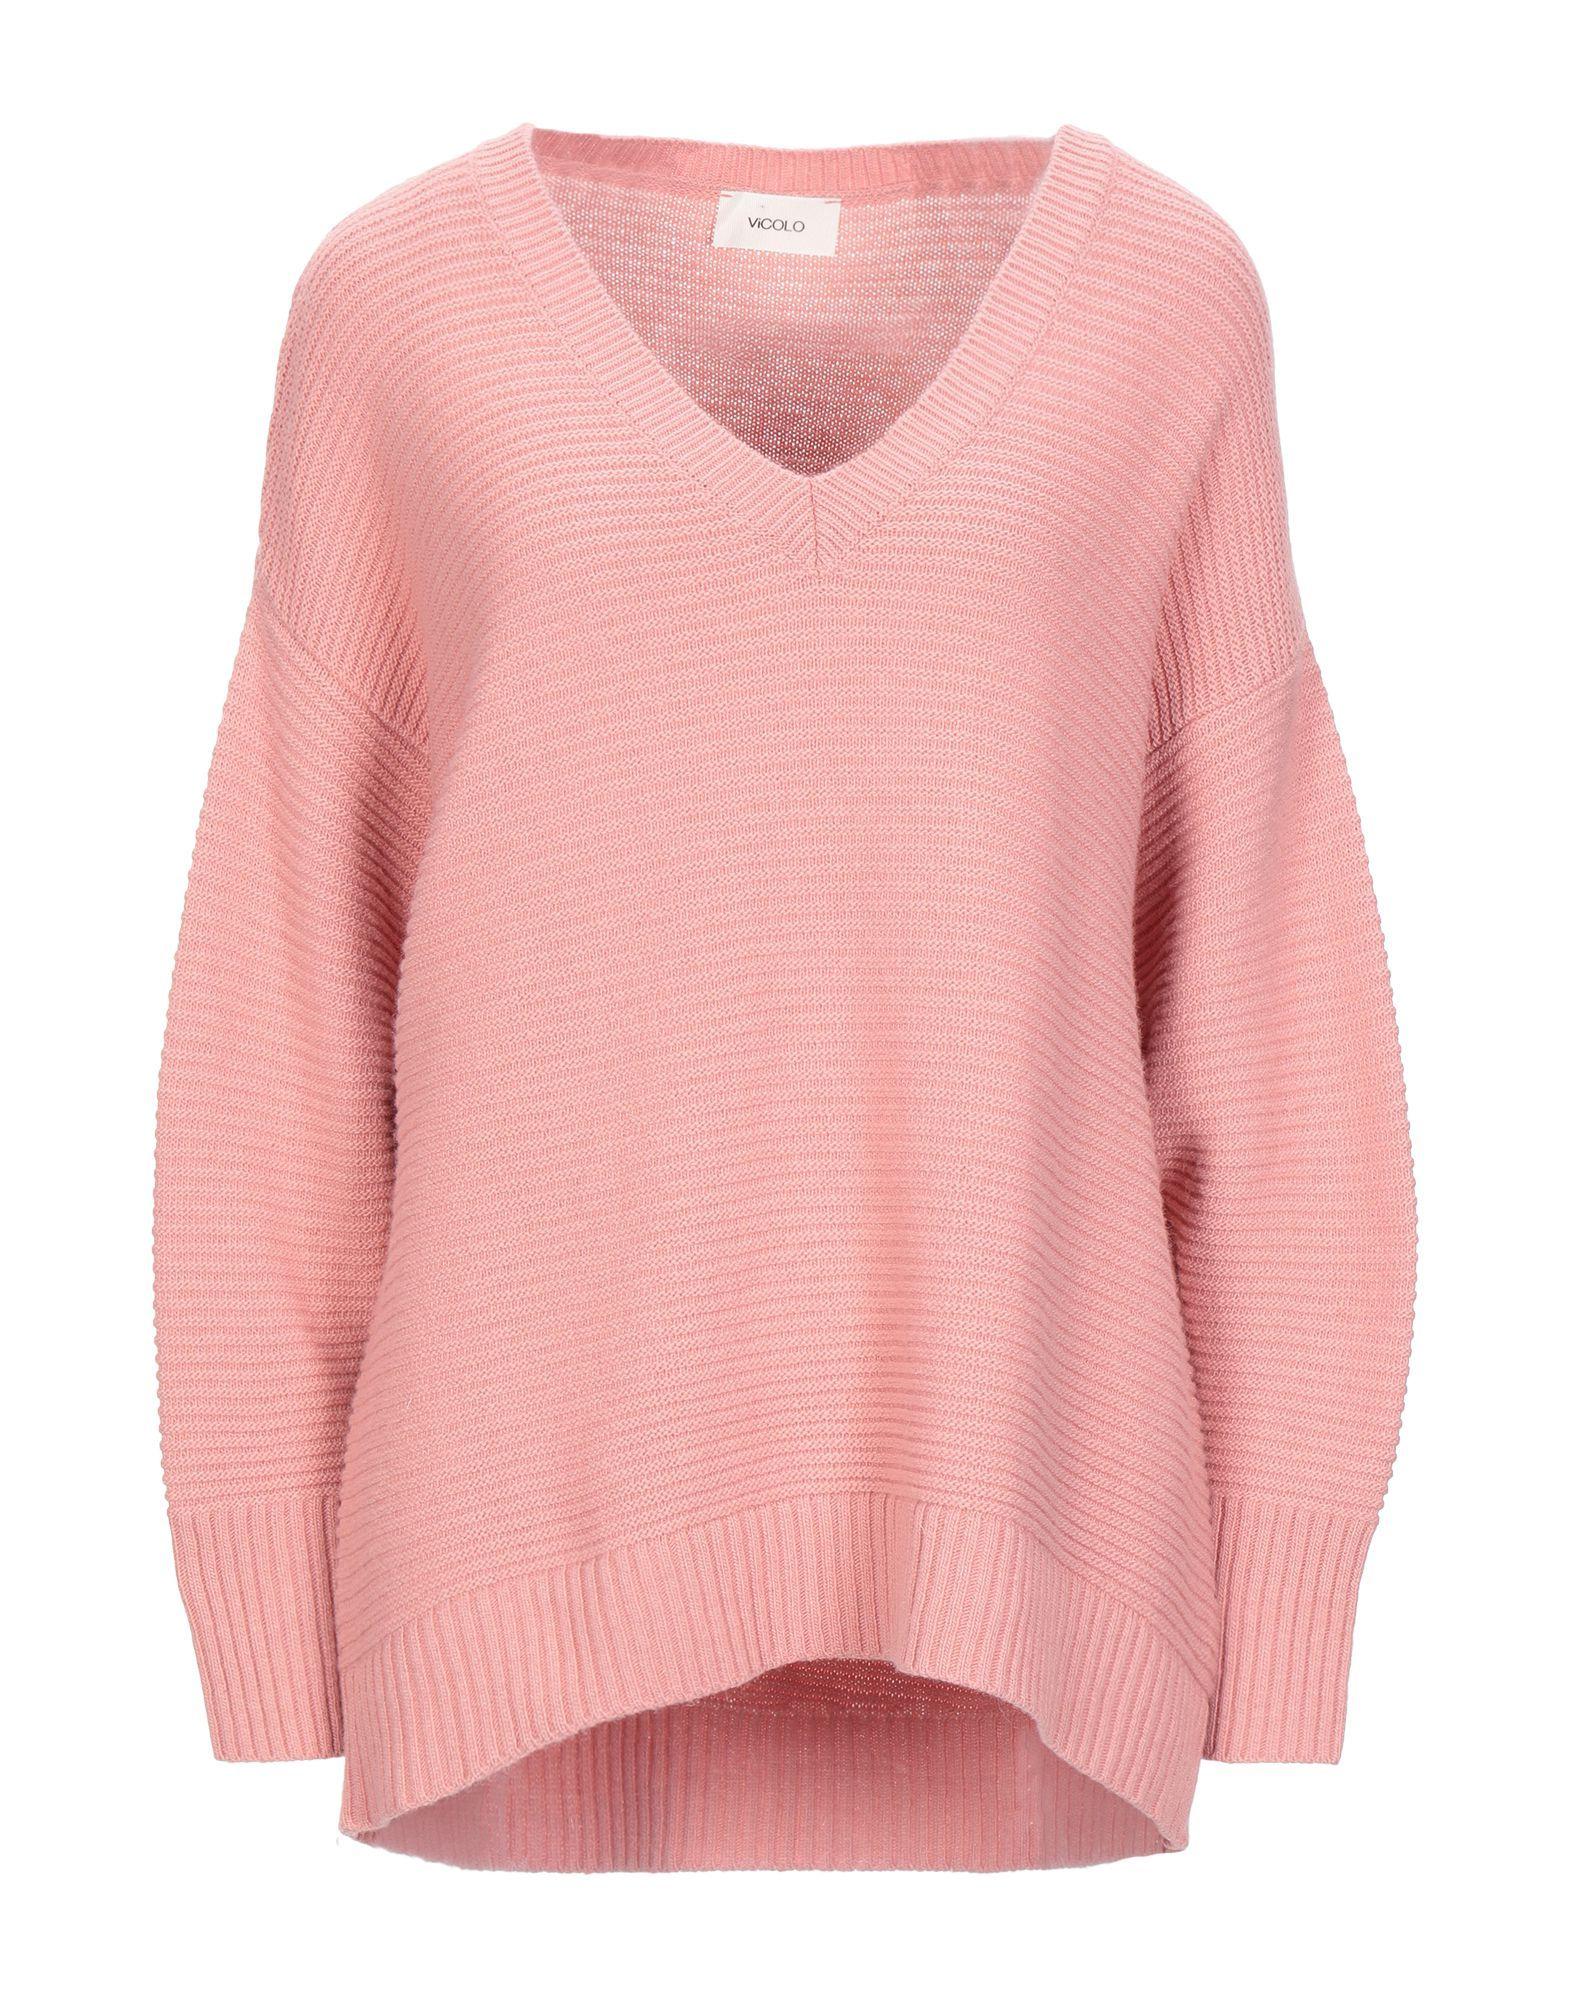 Vicolo Pink Knit Jumper